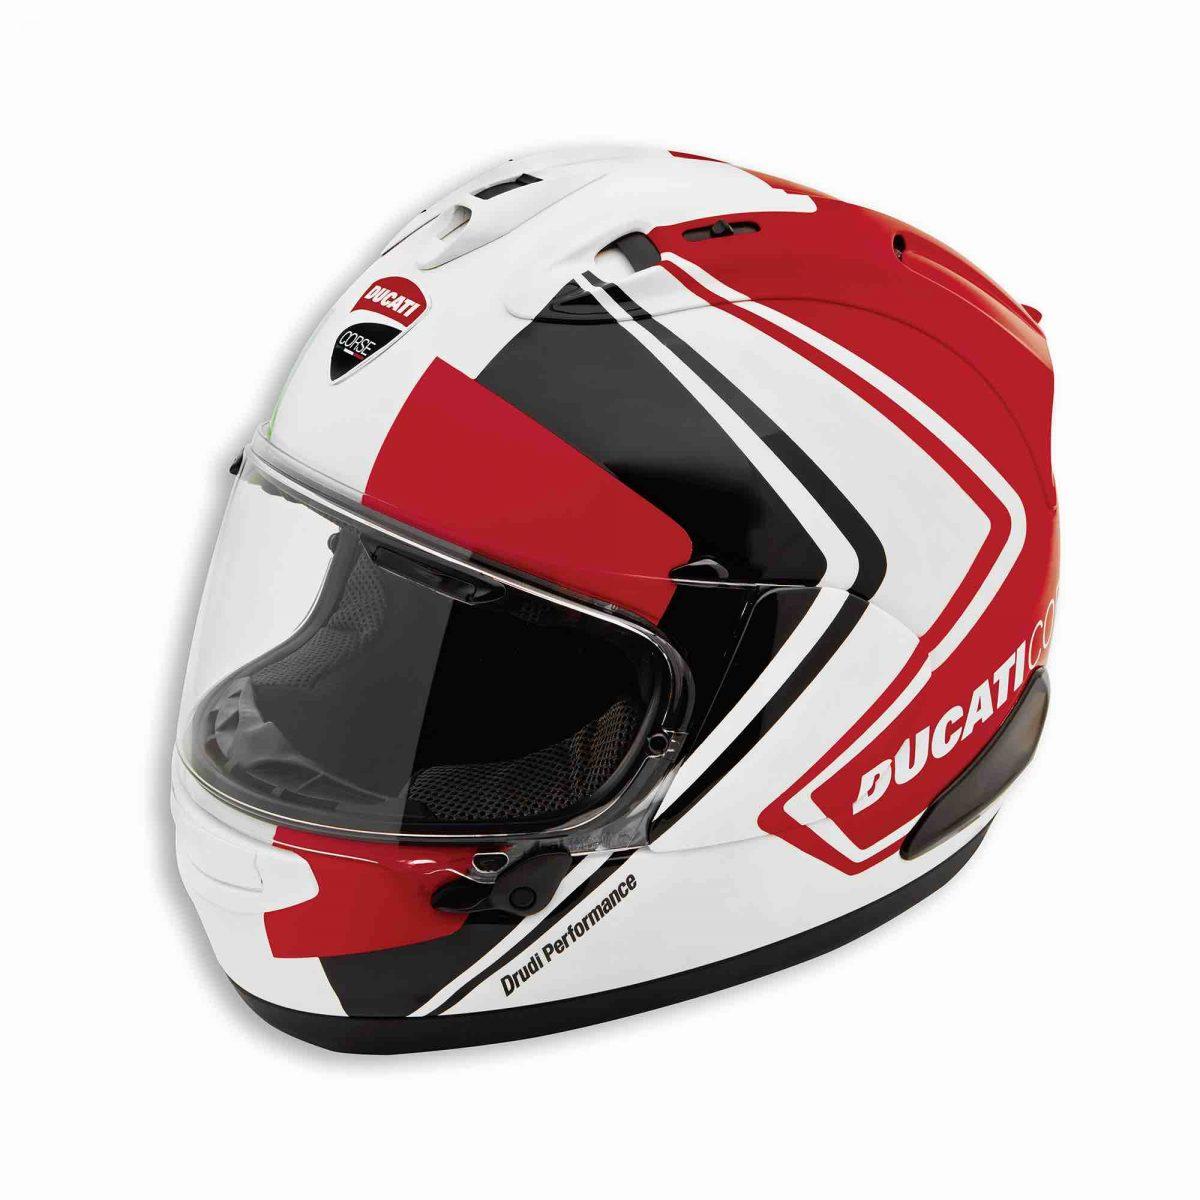 Ducati Corse SBK Speed 2